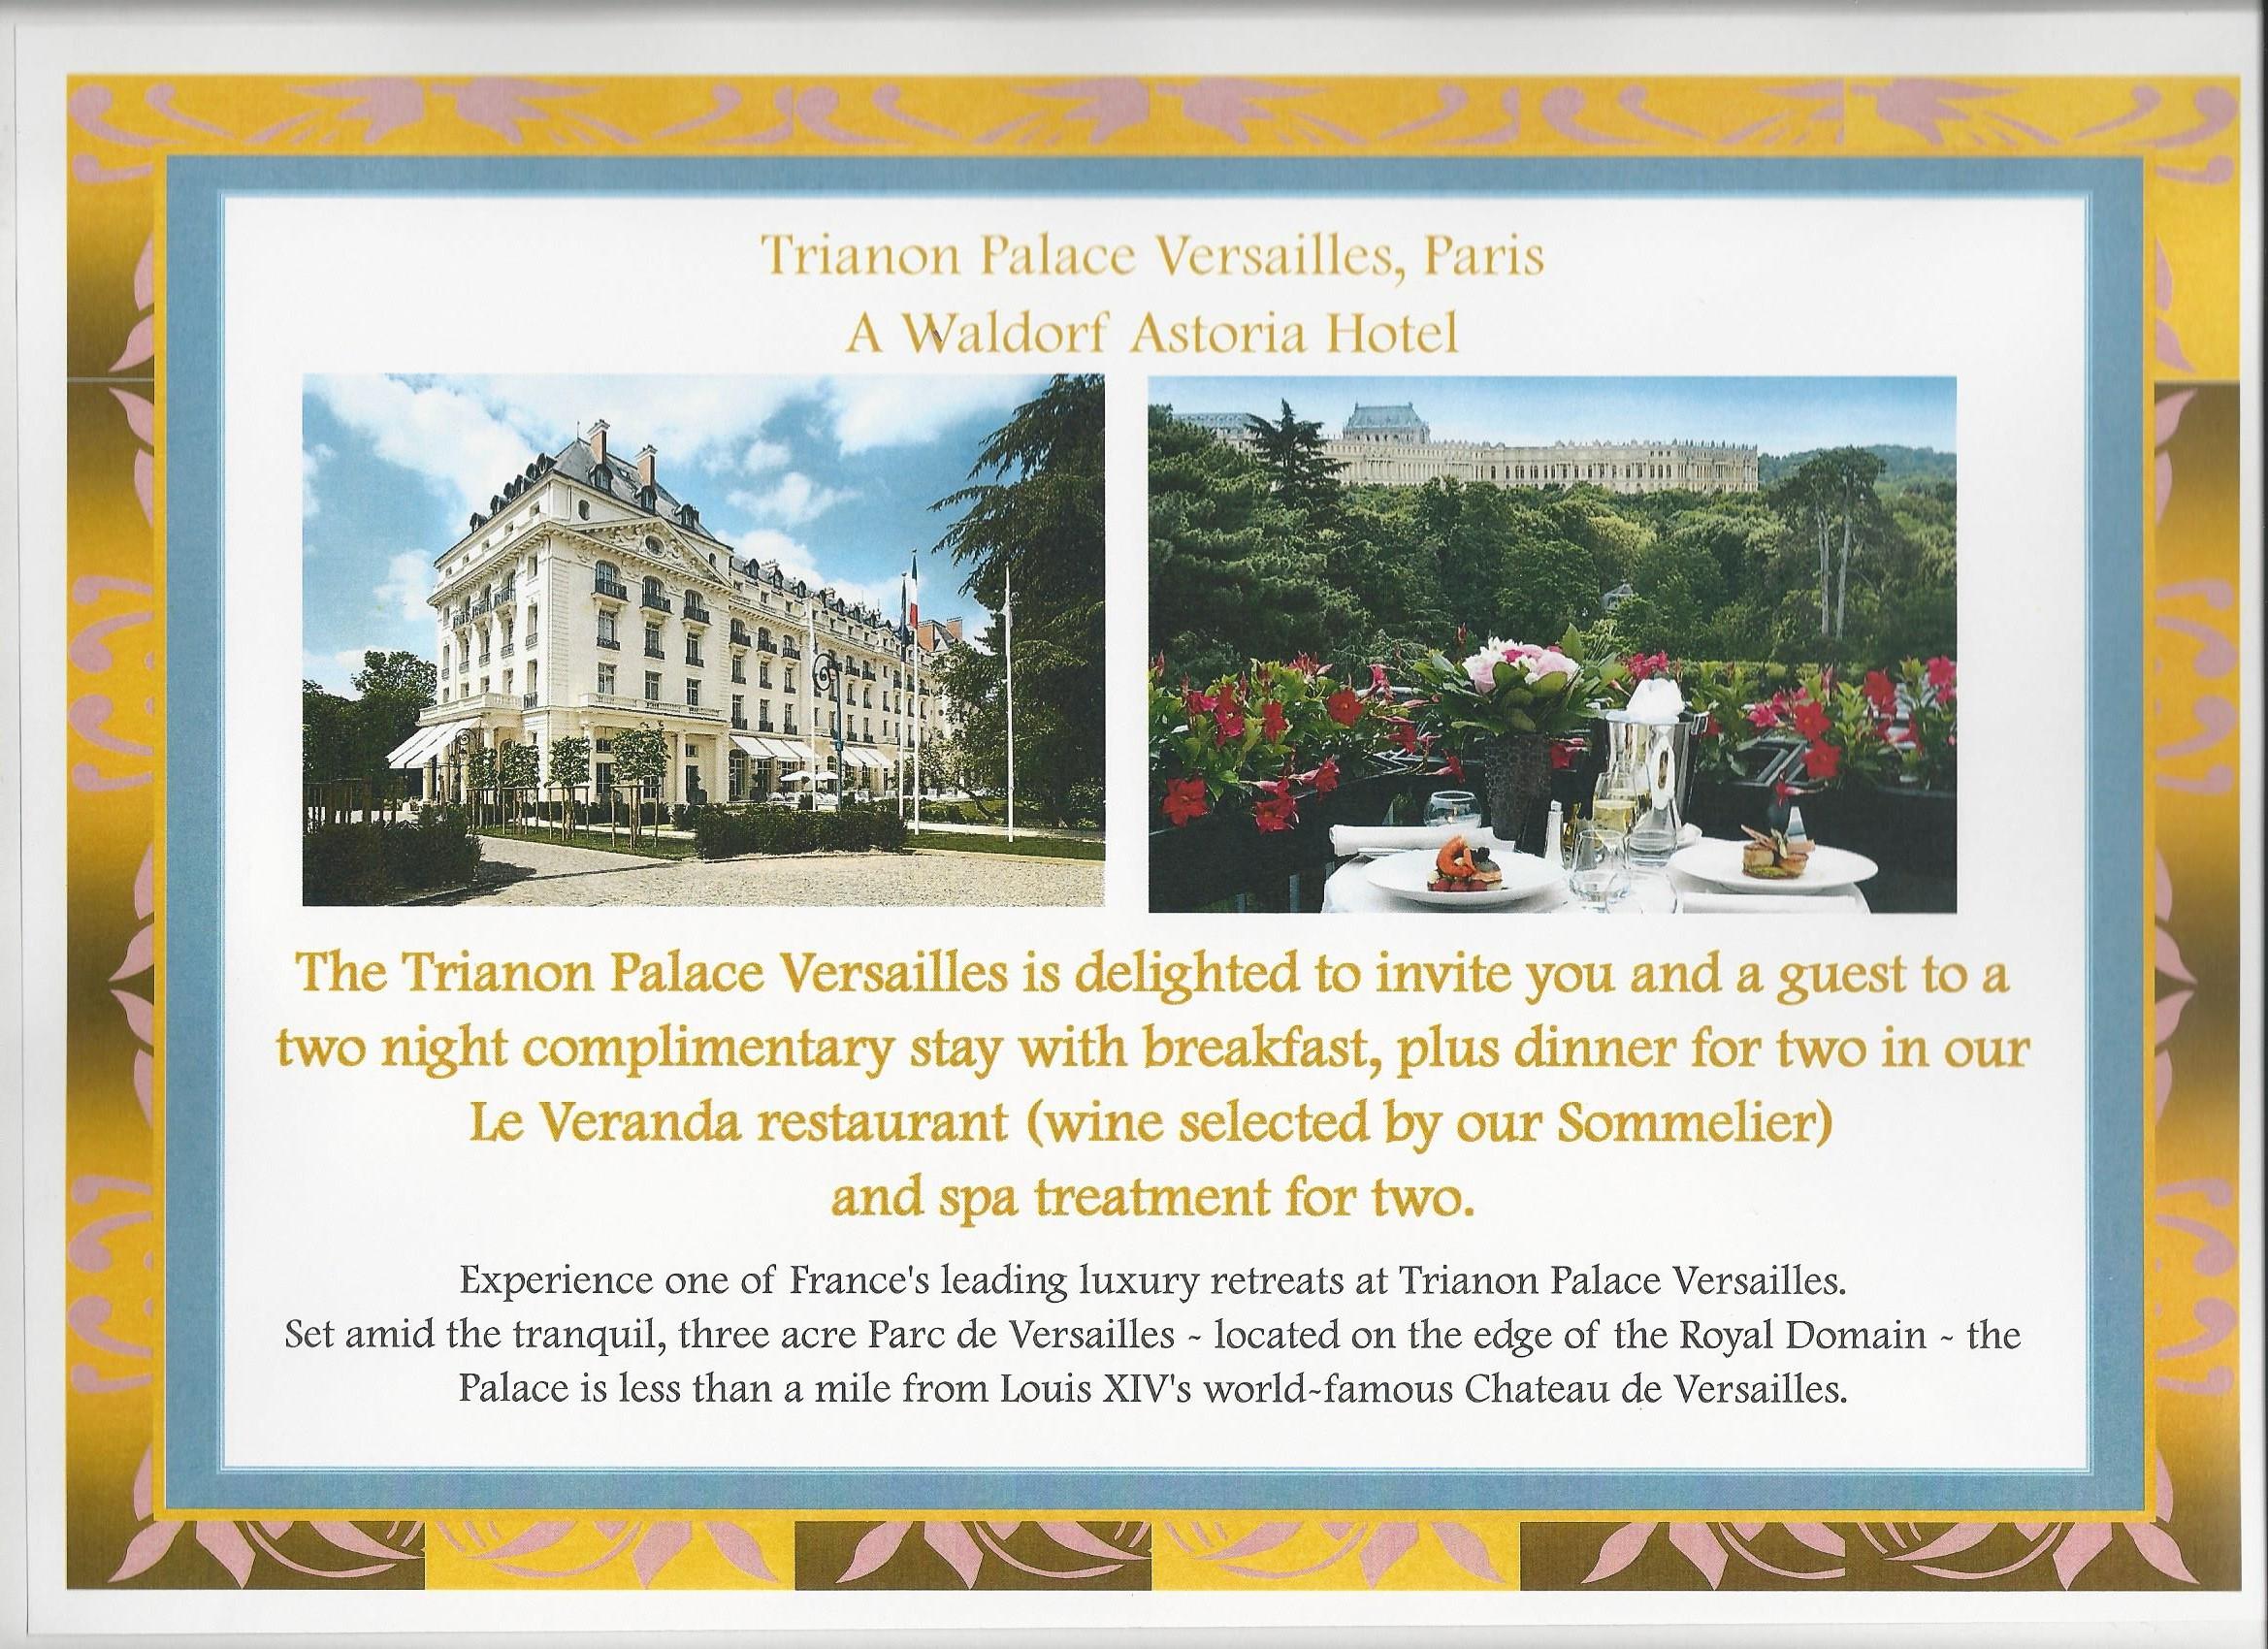 Trianon Palace Versailles, Paris. A Waldorf Astoria hotel